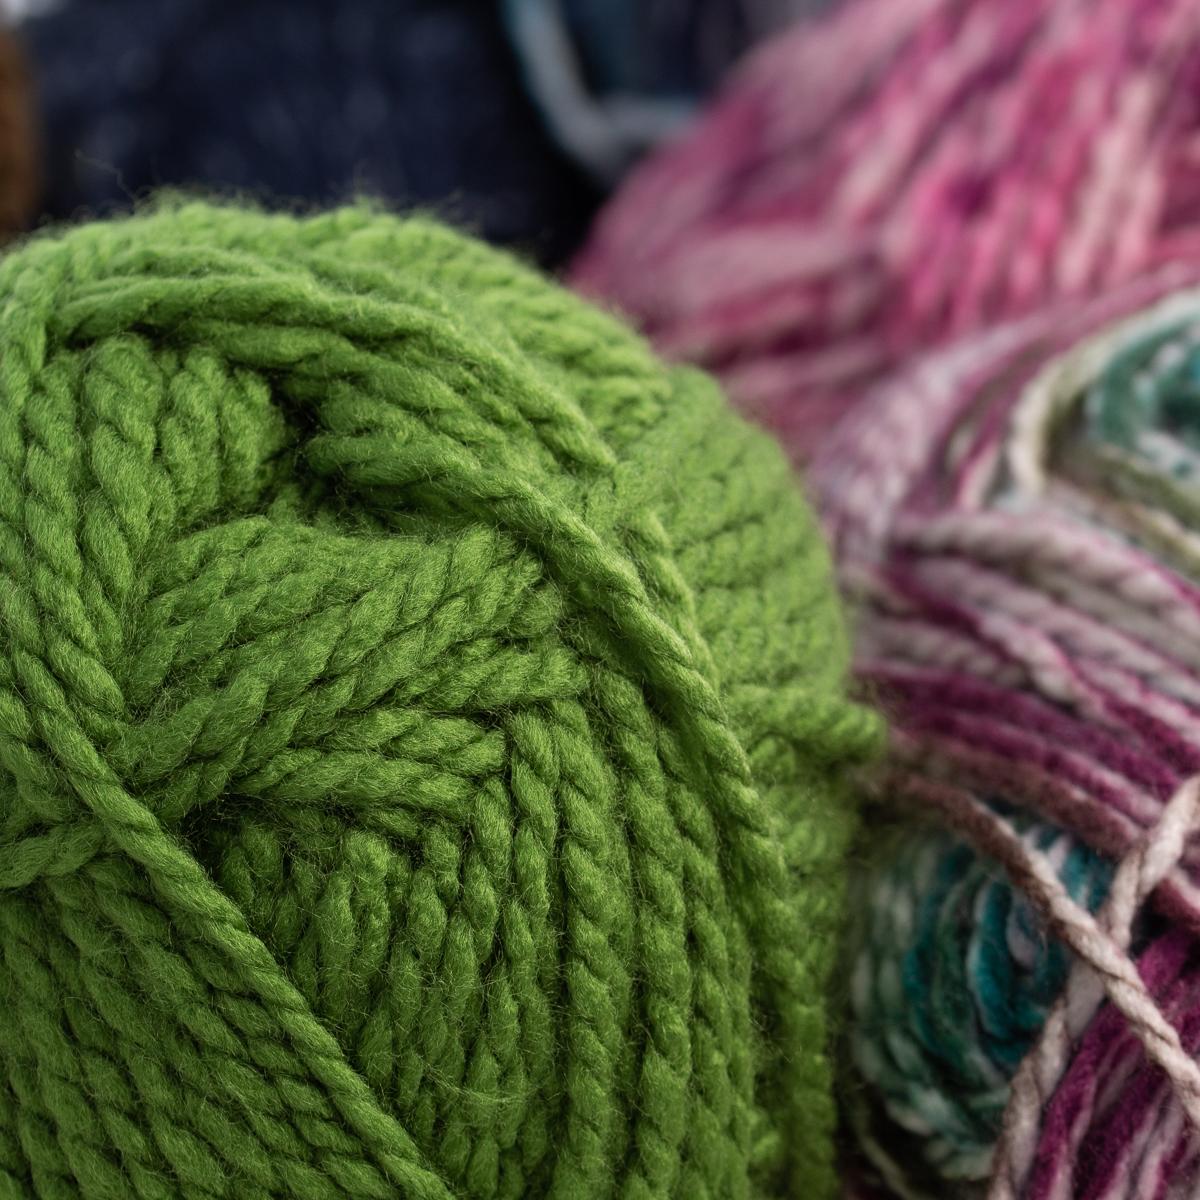 3pk-Premier-Yarns-Deborah-Norville-Serenity-100-Acrylic-Yarn-Chunky-5-Knitting thumbnail 59